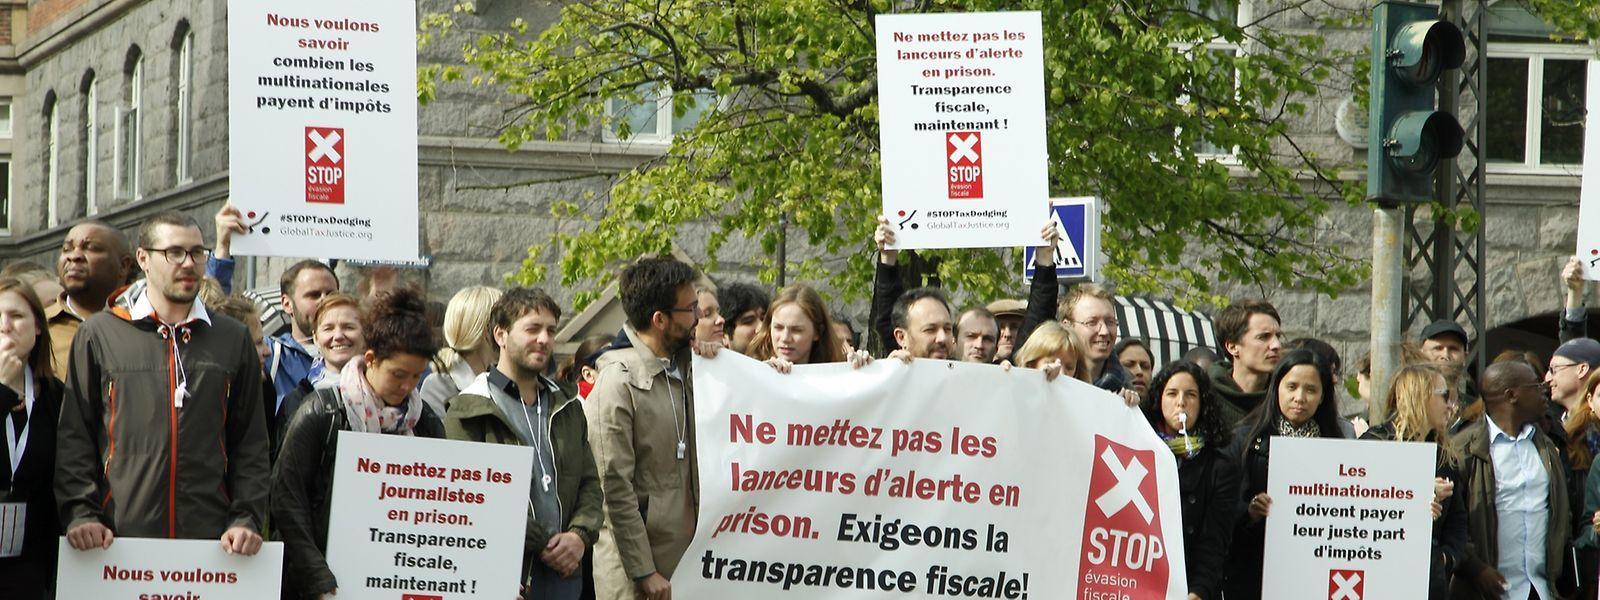 La manifestation ce jeudi devant l'ambassade de Copenhague.